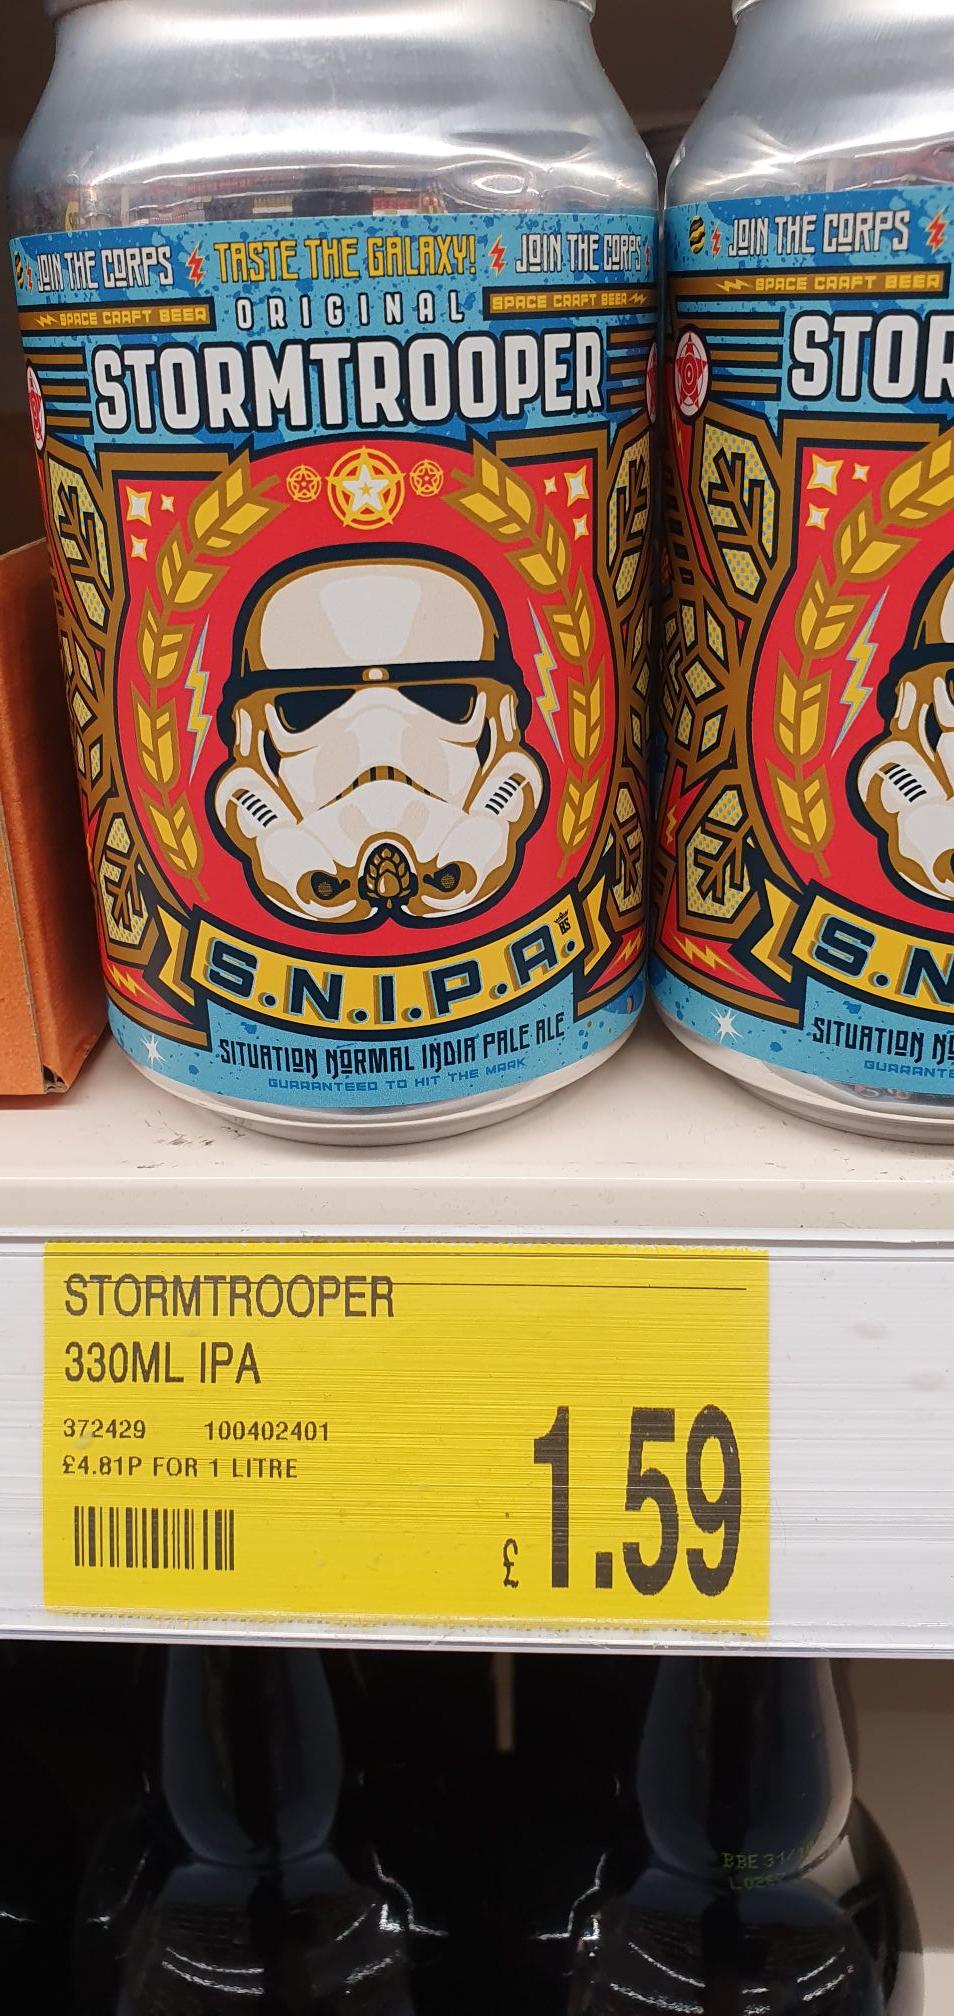 Stormtrooper S.N.I.P.A 330ml cans £1.59 at B&M Lowestoft High Street